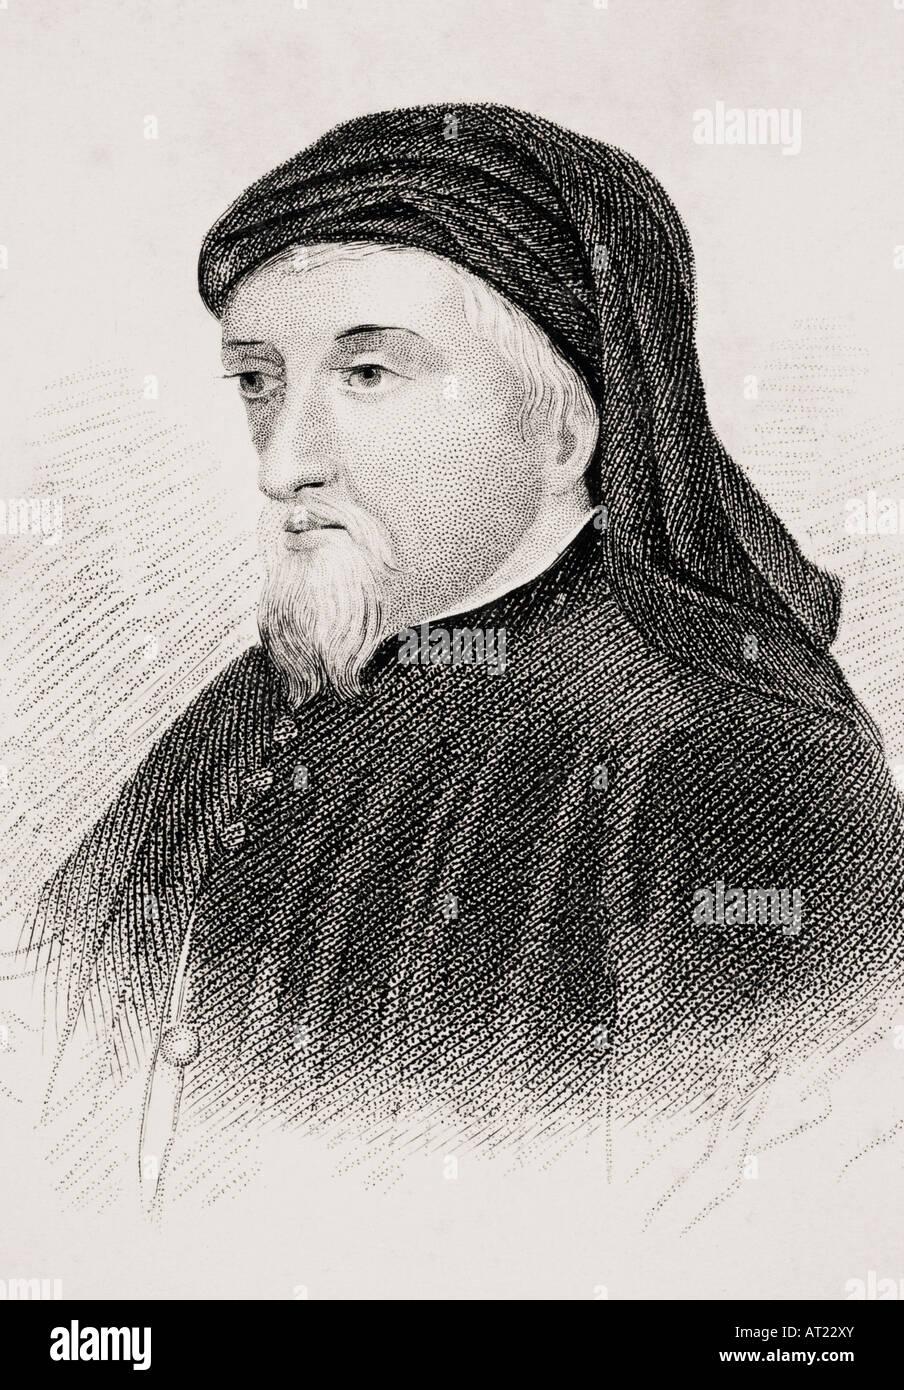 Geoffrey Chaucer c 1342 3 1400 English writer - Stock Image